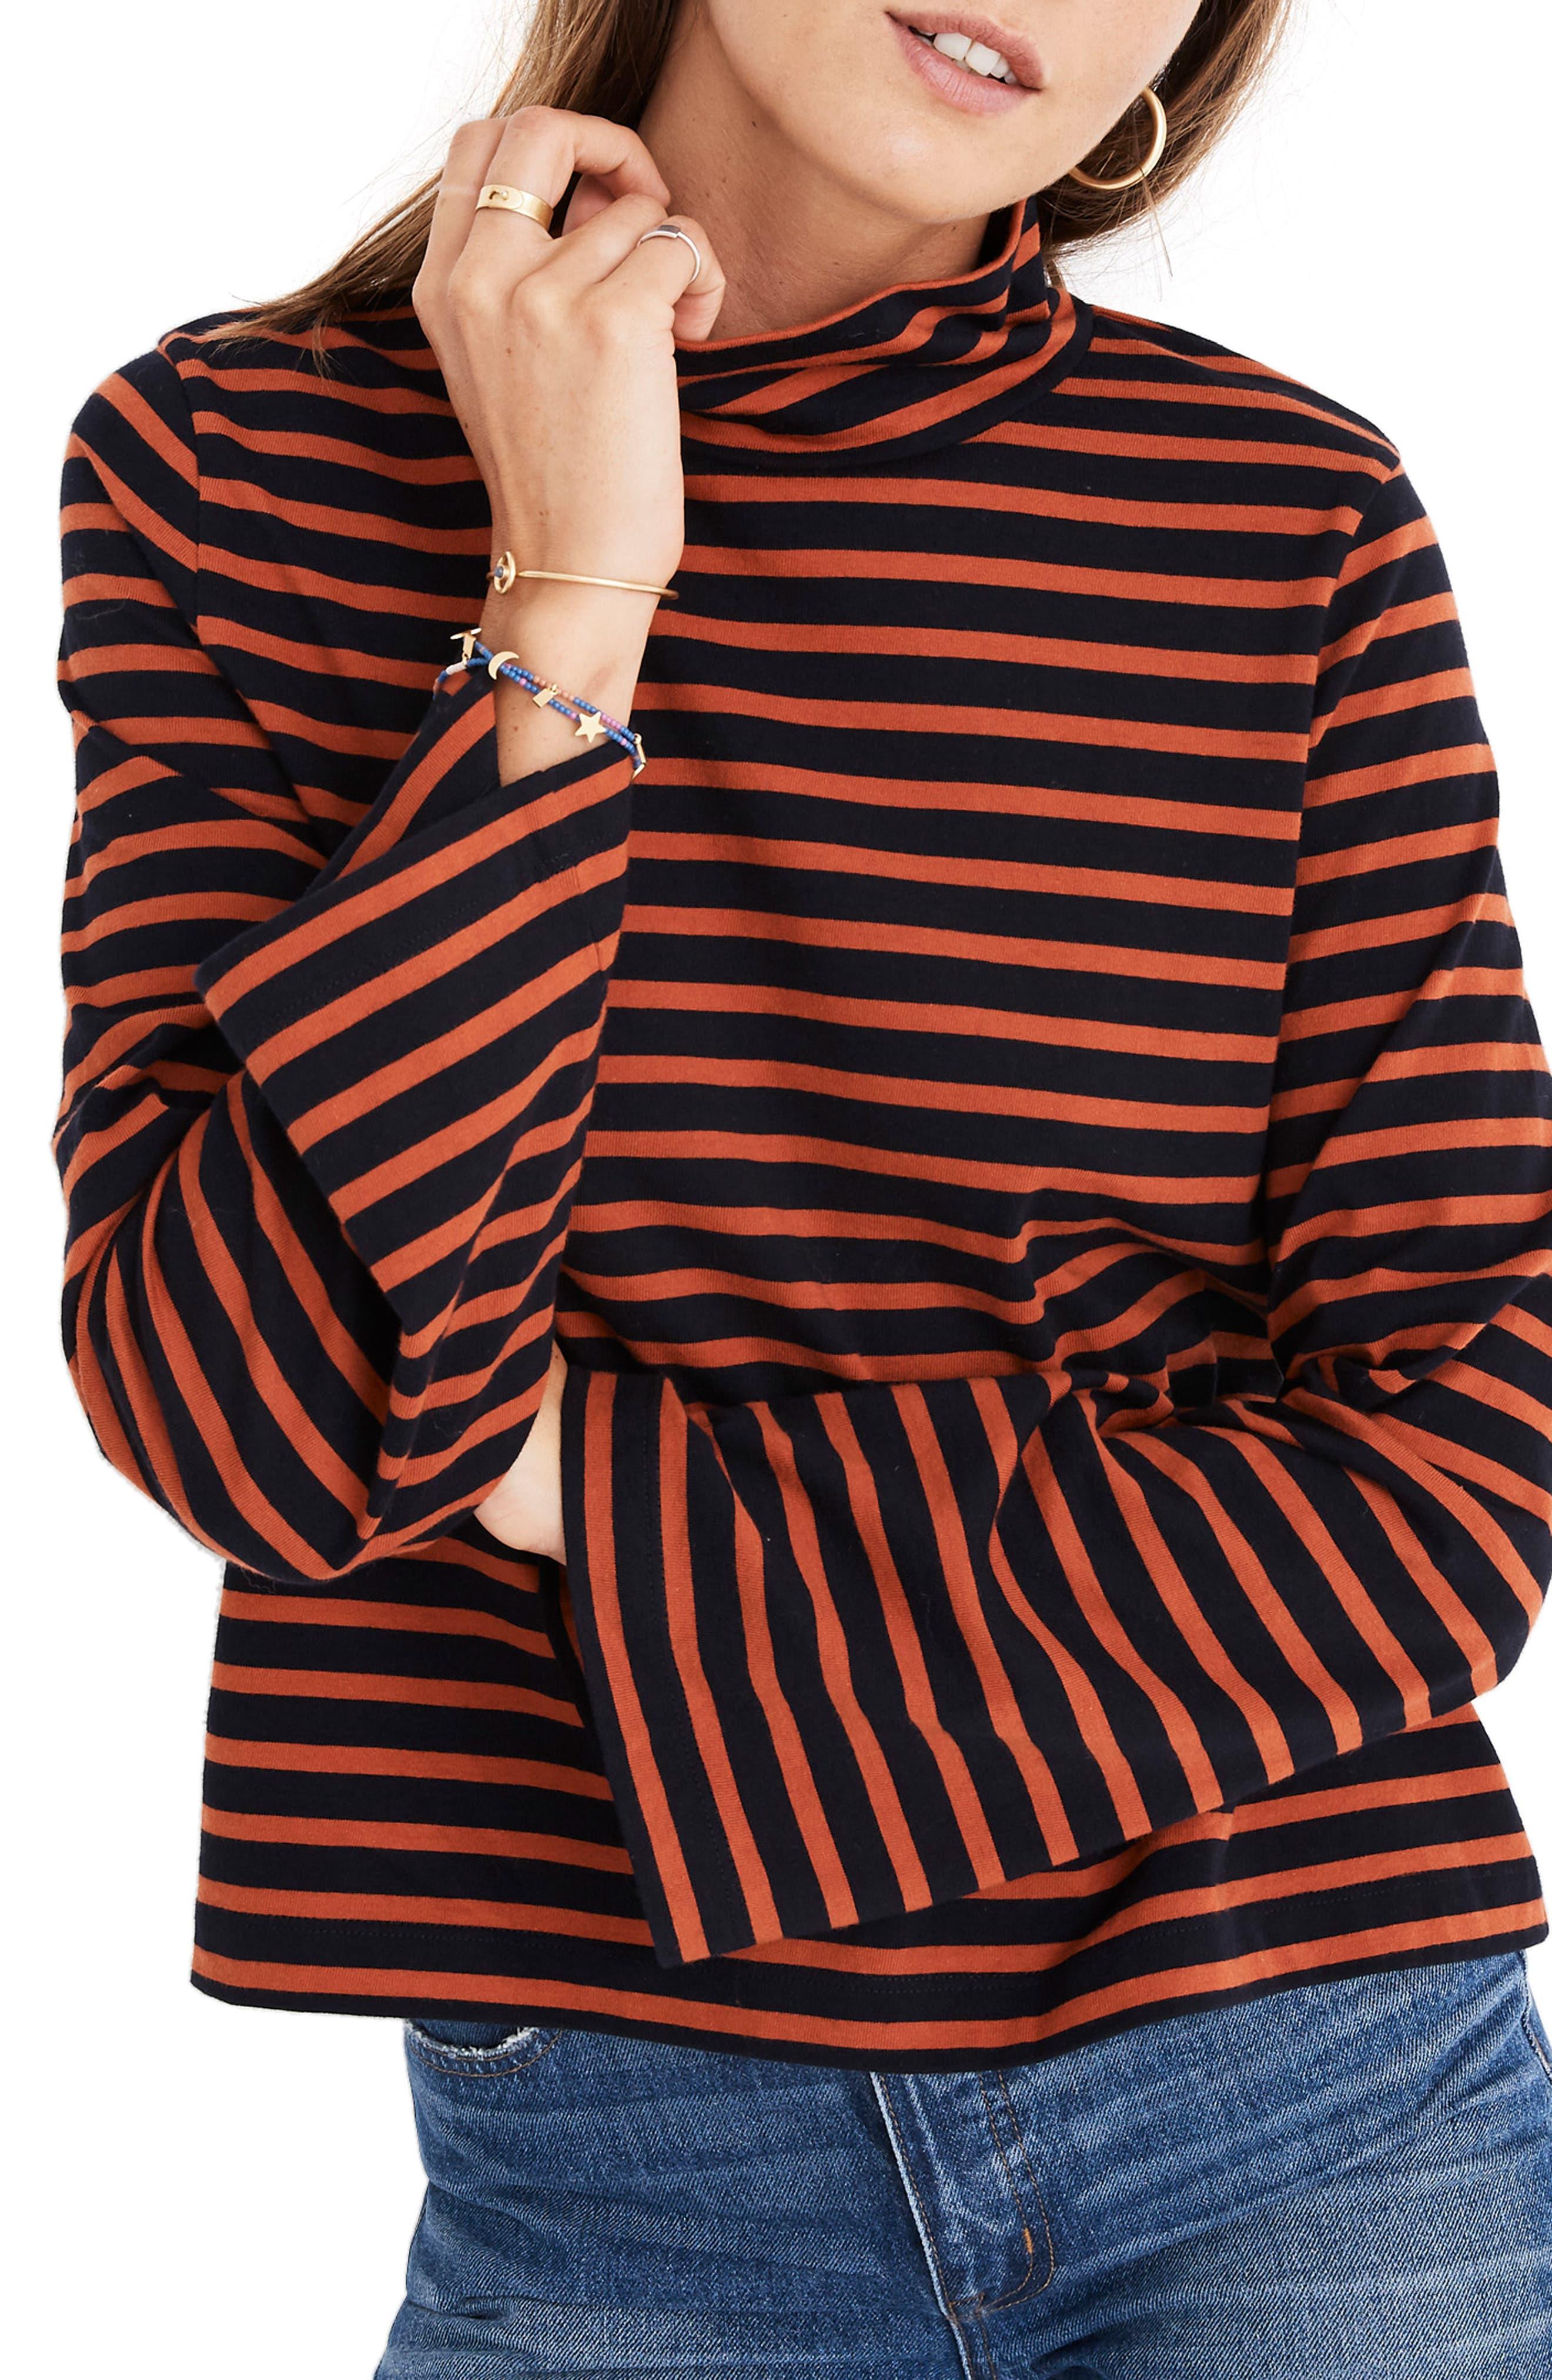 MADEWELL,                             Stripe Wide Sleeve Turtleneck,                             Main thumbnail 1, color,                             400